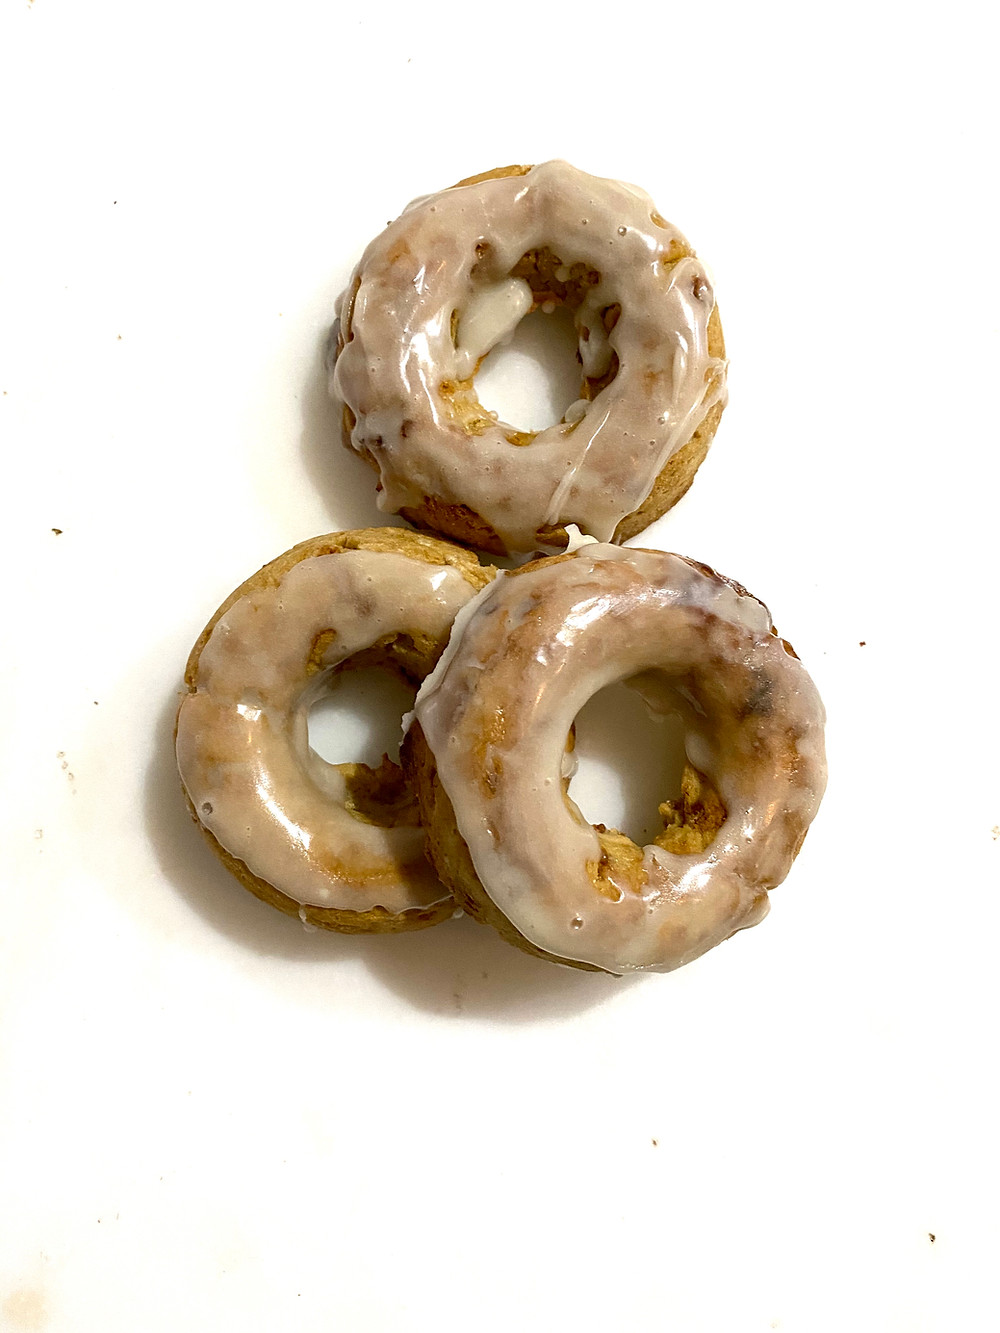 Gluten free glazed donuts